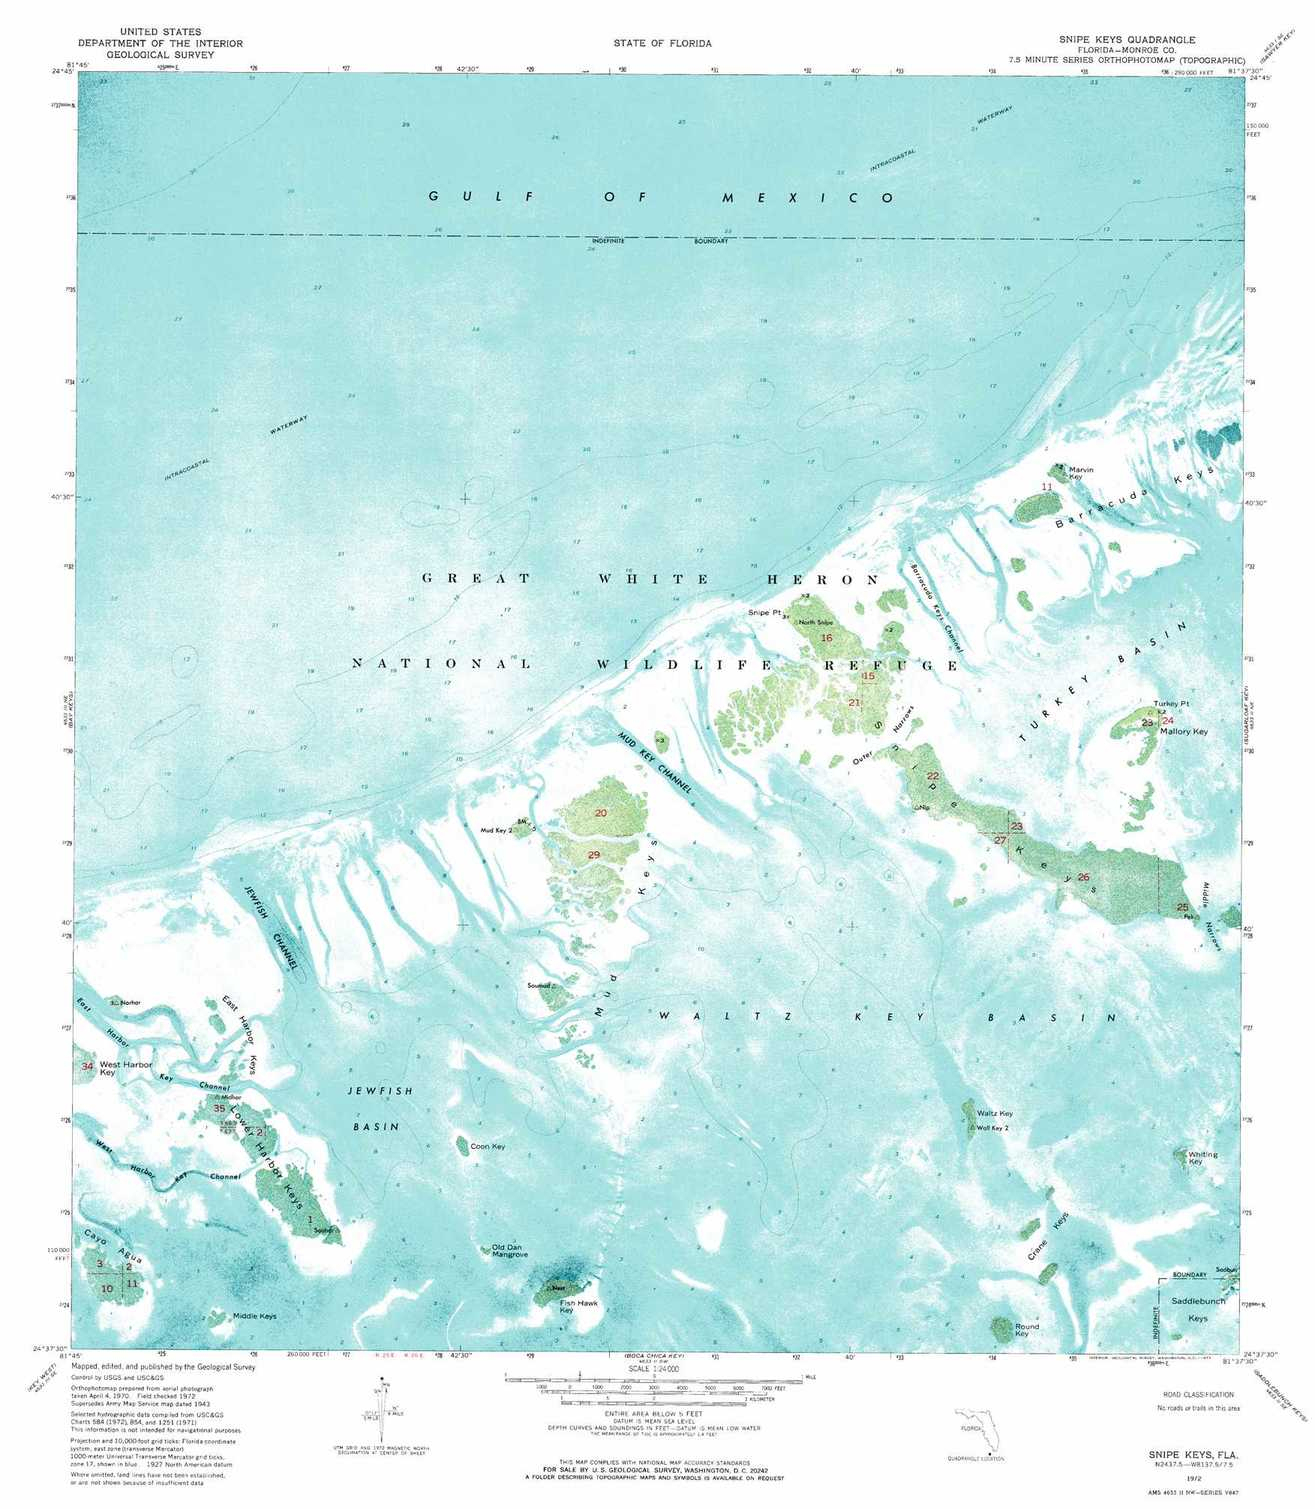 Snipe Keys Topographic Map, Fl - Usgs Topo Quad 24081F6 - Florida Keys Topographic Map